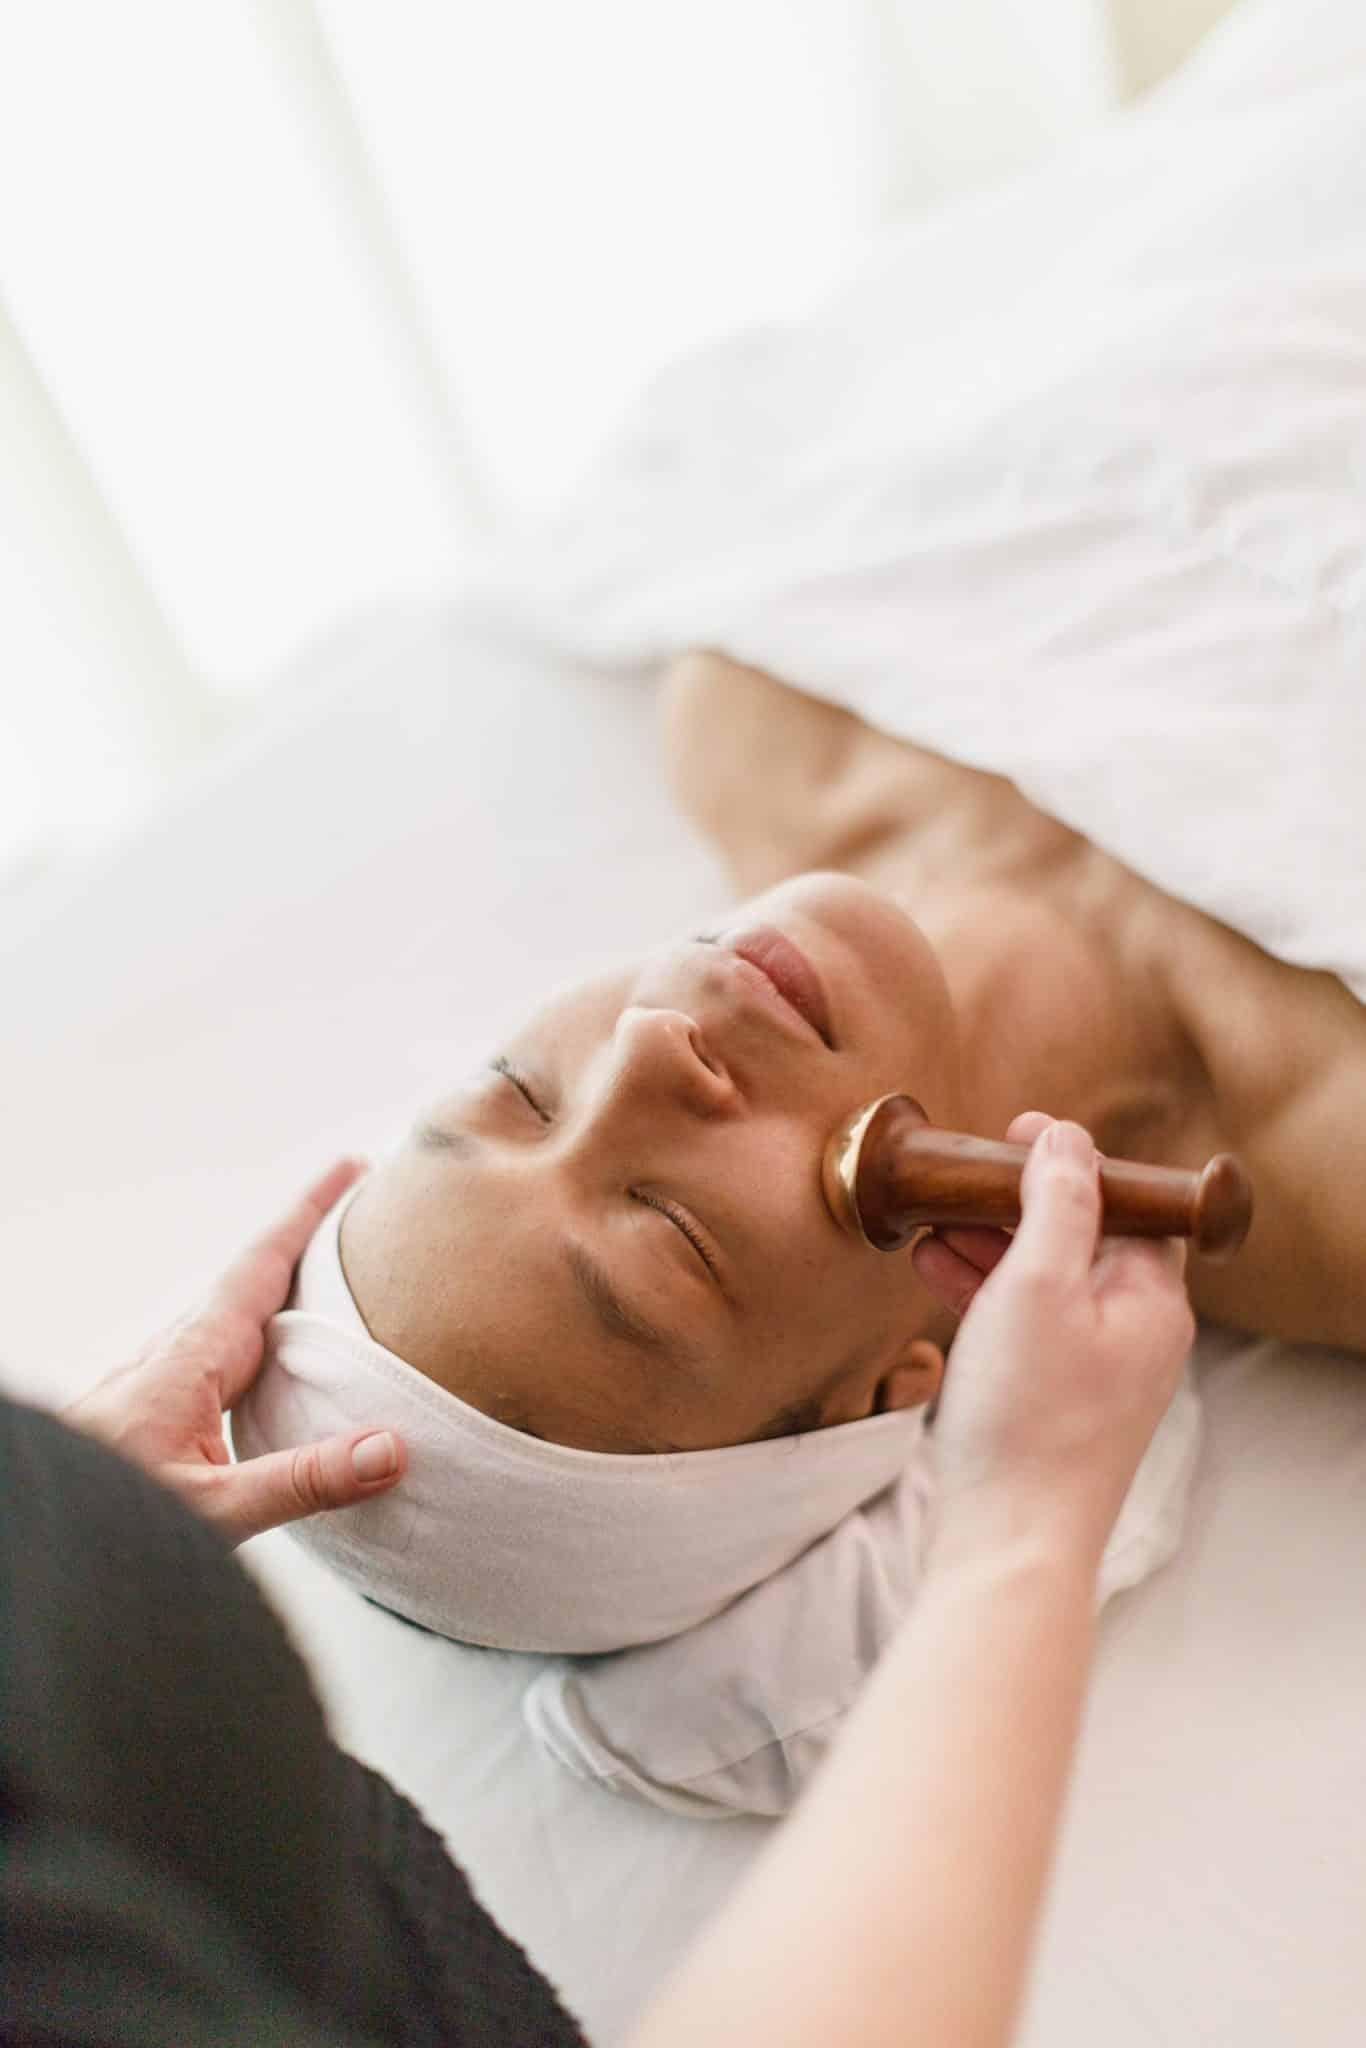 A person getting a facial